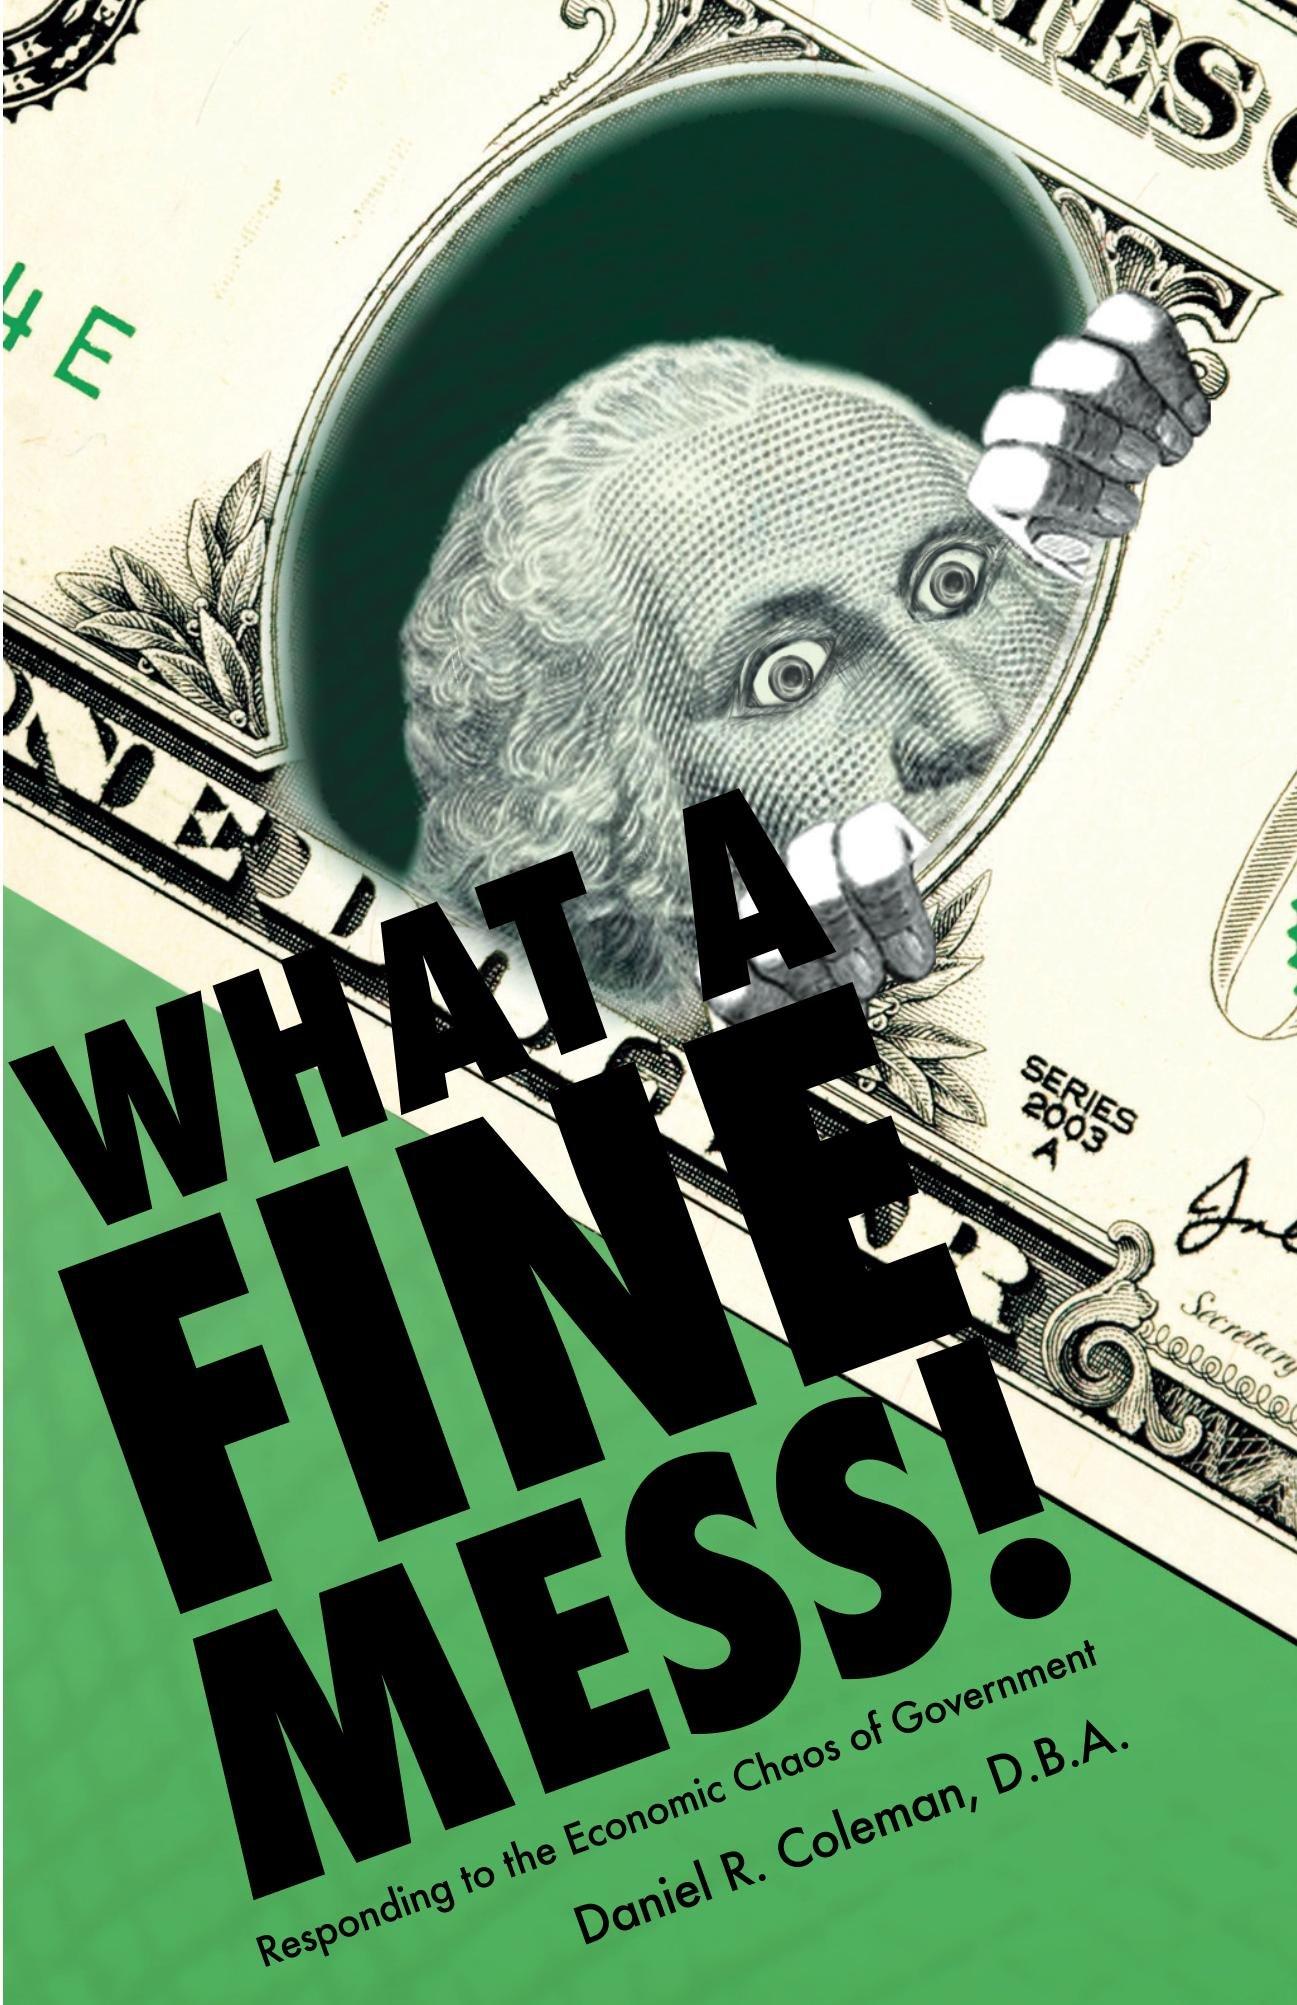 Economic Comic's What A Fine Mess!